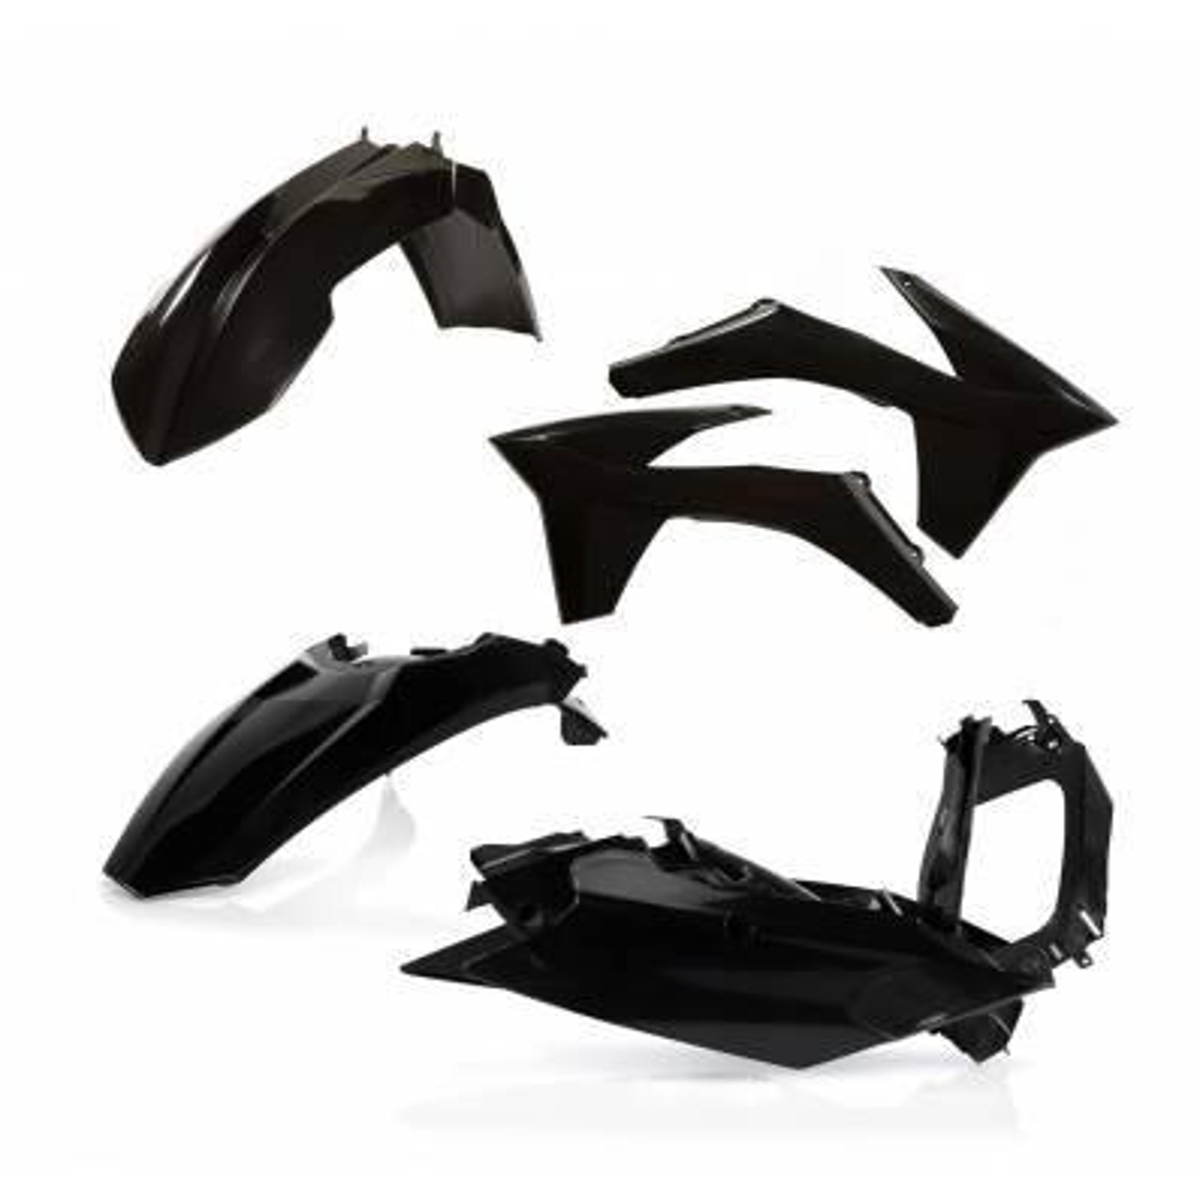 0015705-090 - Kit Plasticos Sx 125 11 12 Negro